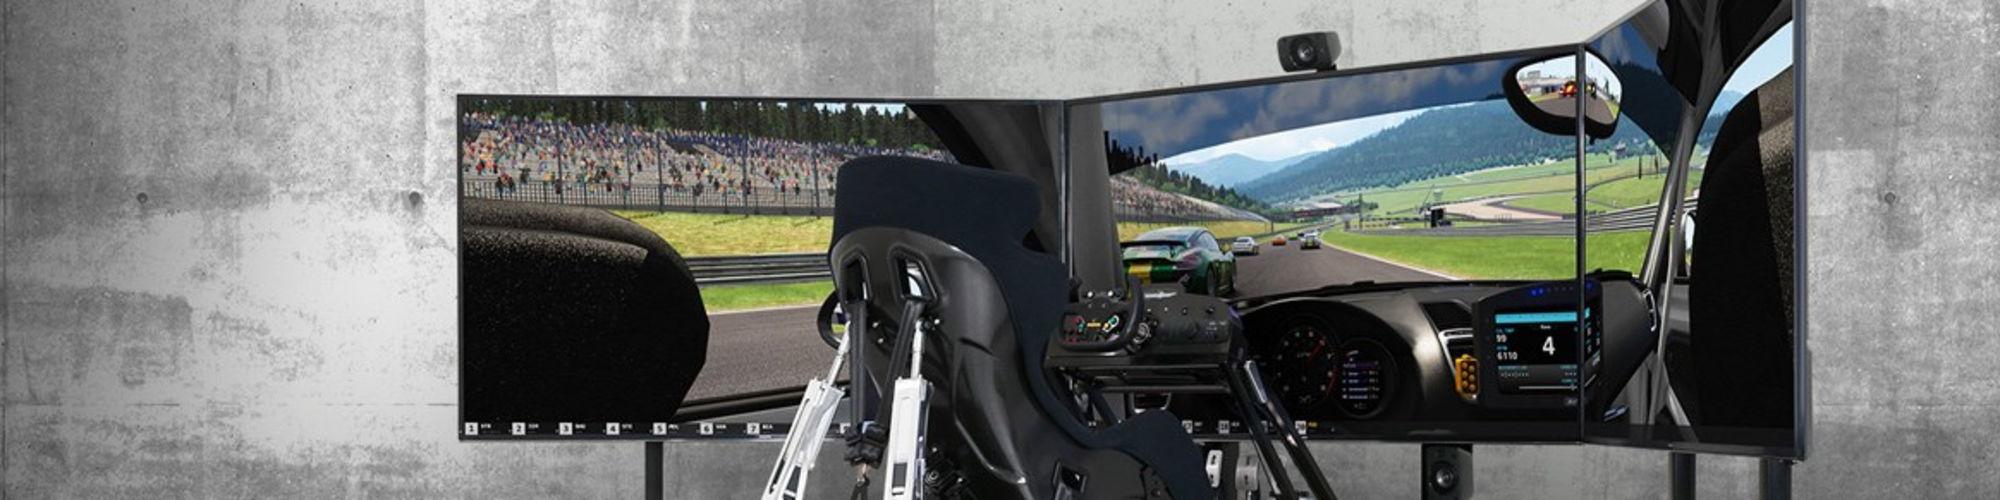 CXC Simulations  cover image